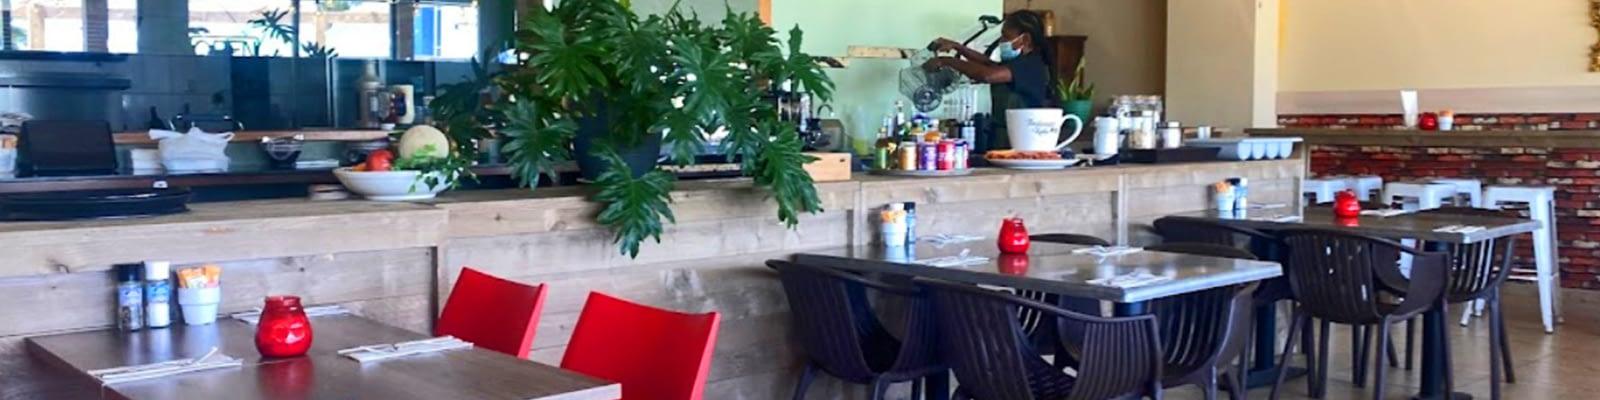 panino-restaurant-bonaire-slider-4